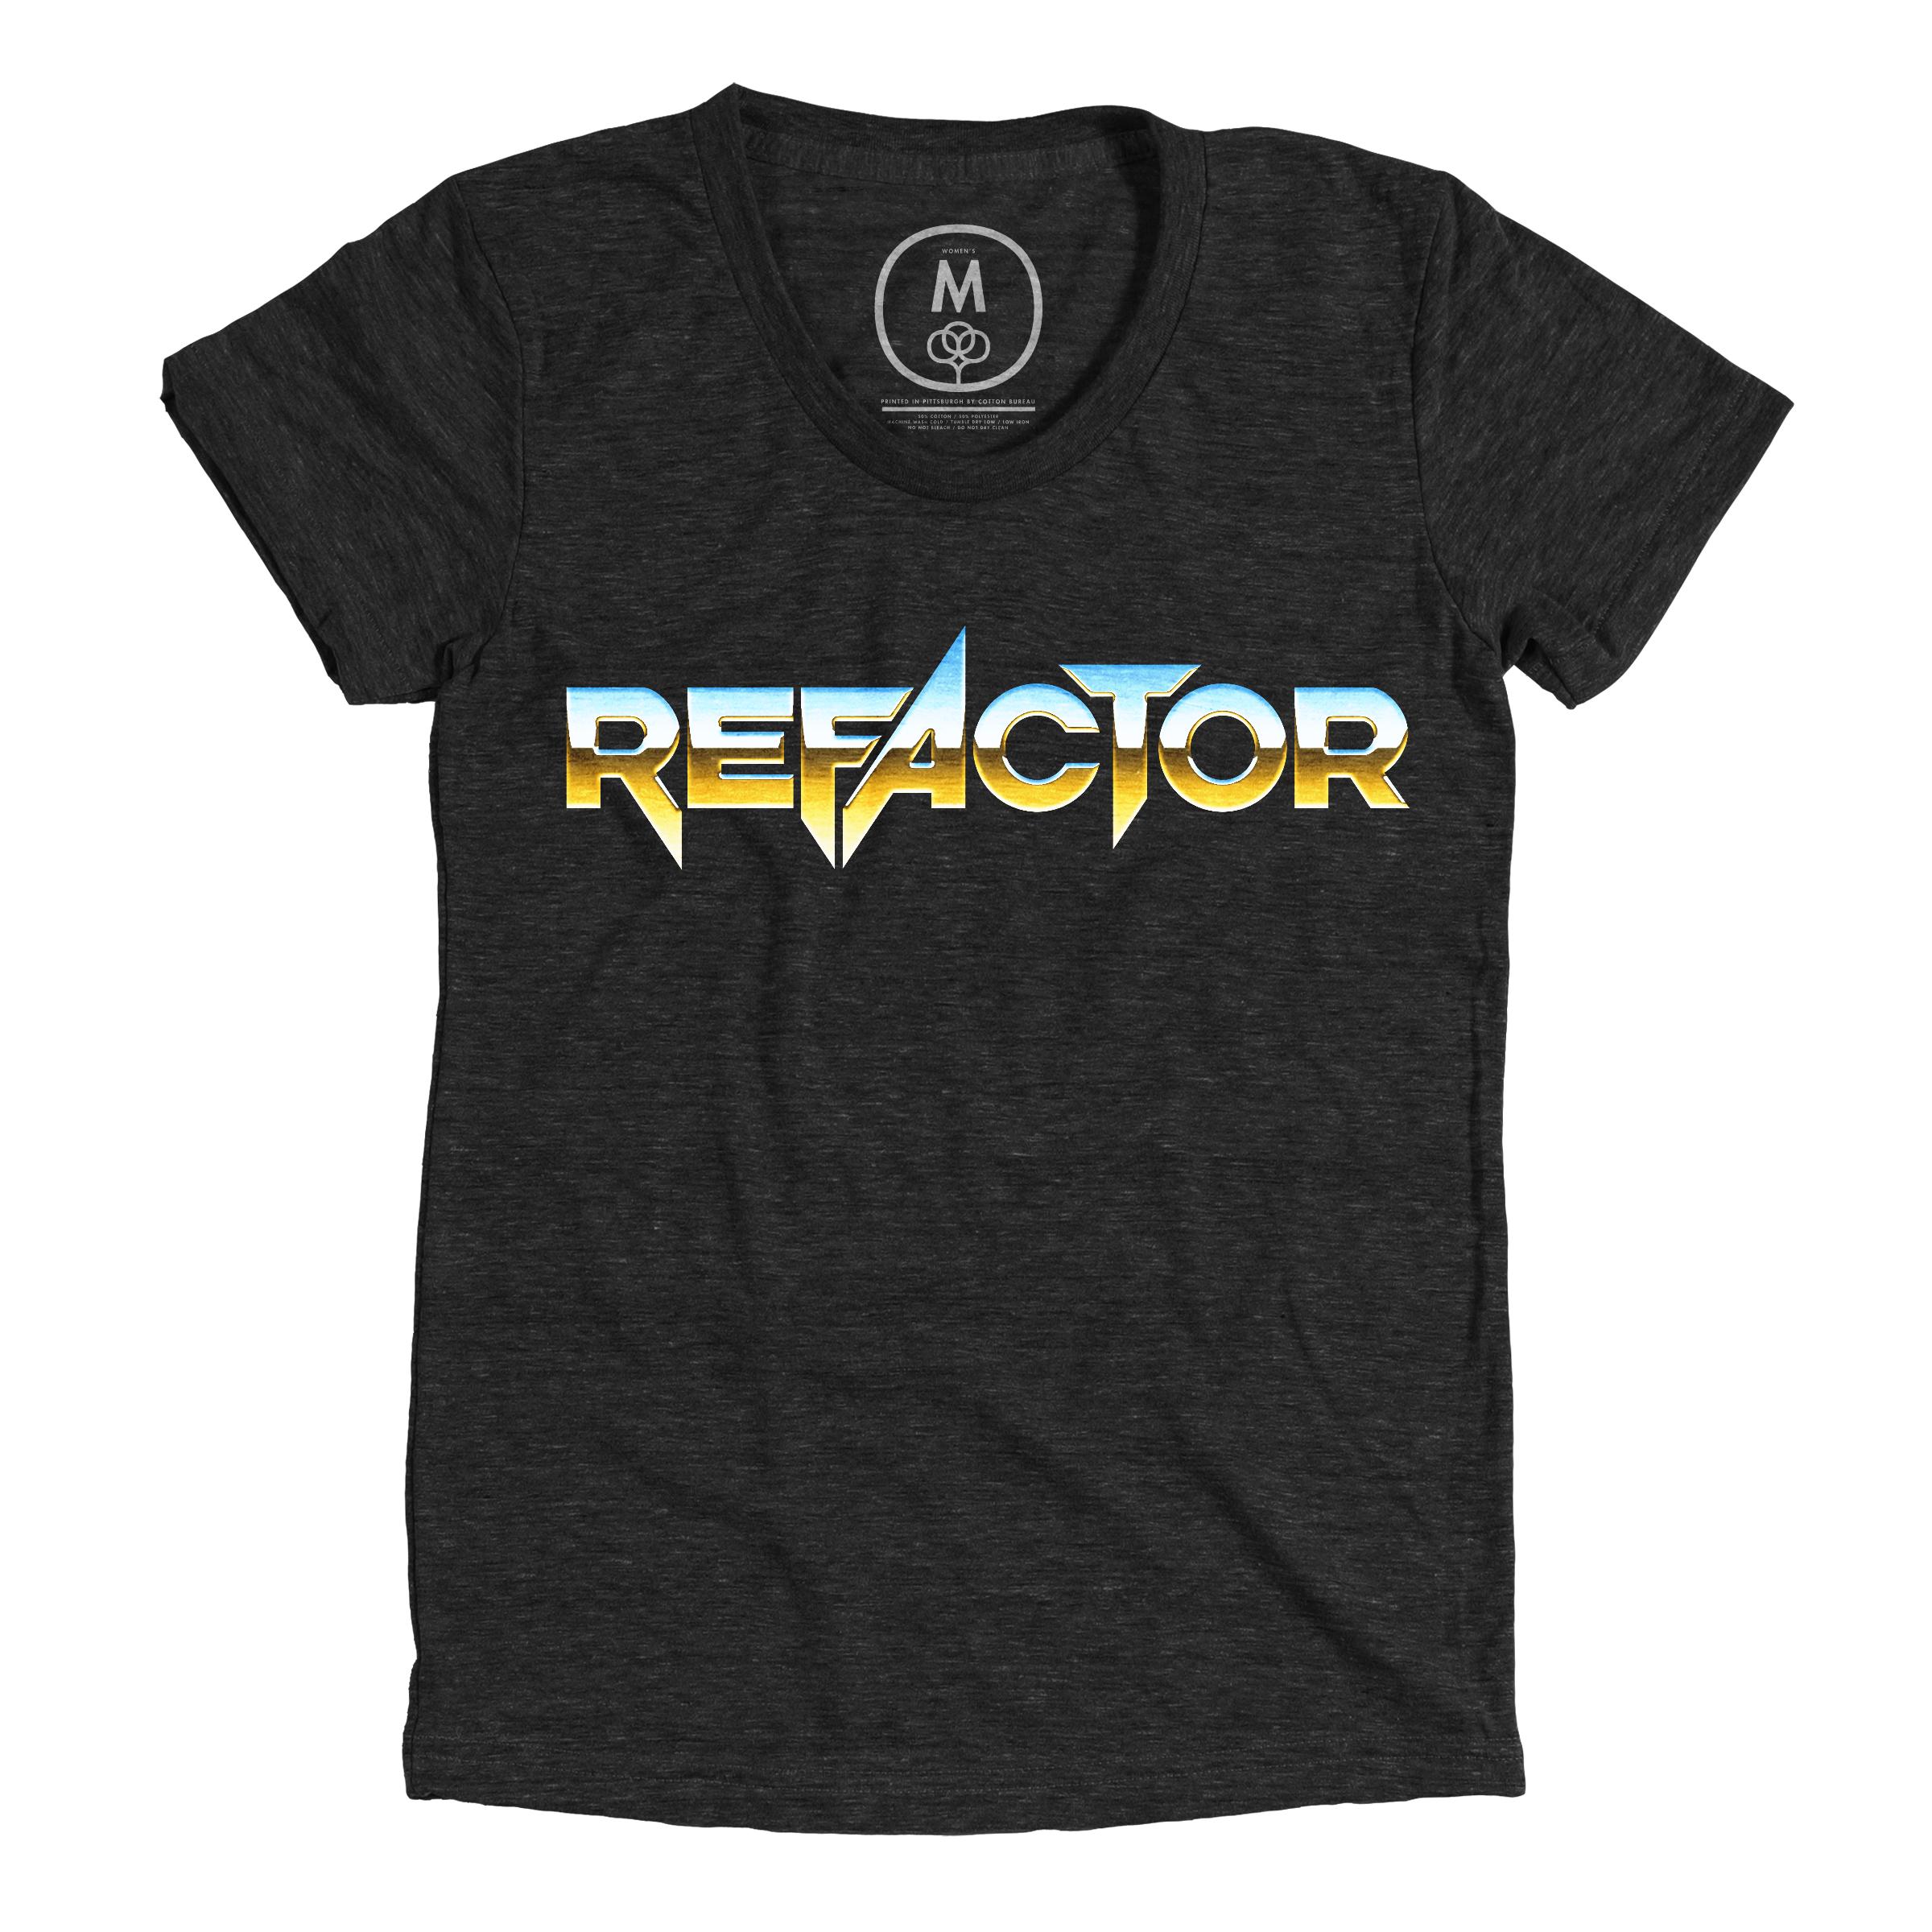 Refactor Vintage Black (Women's)